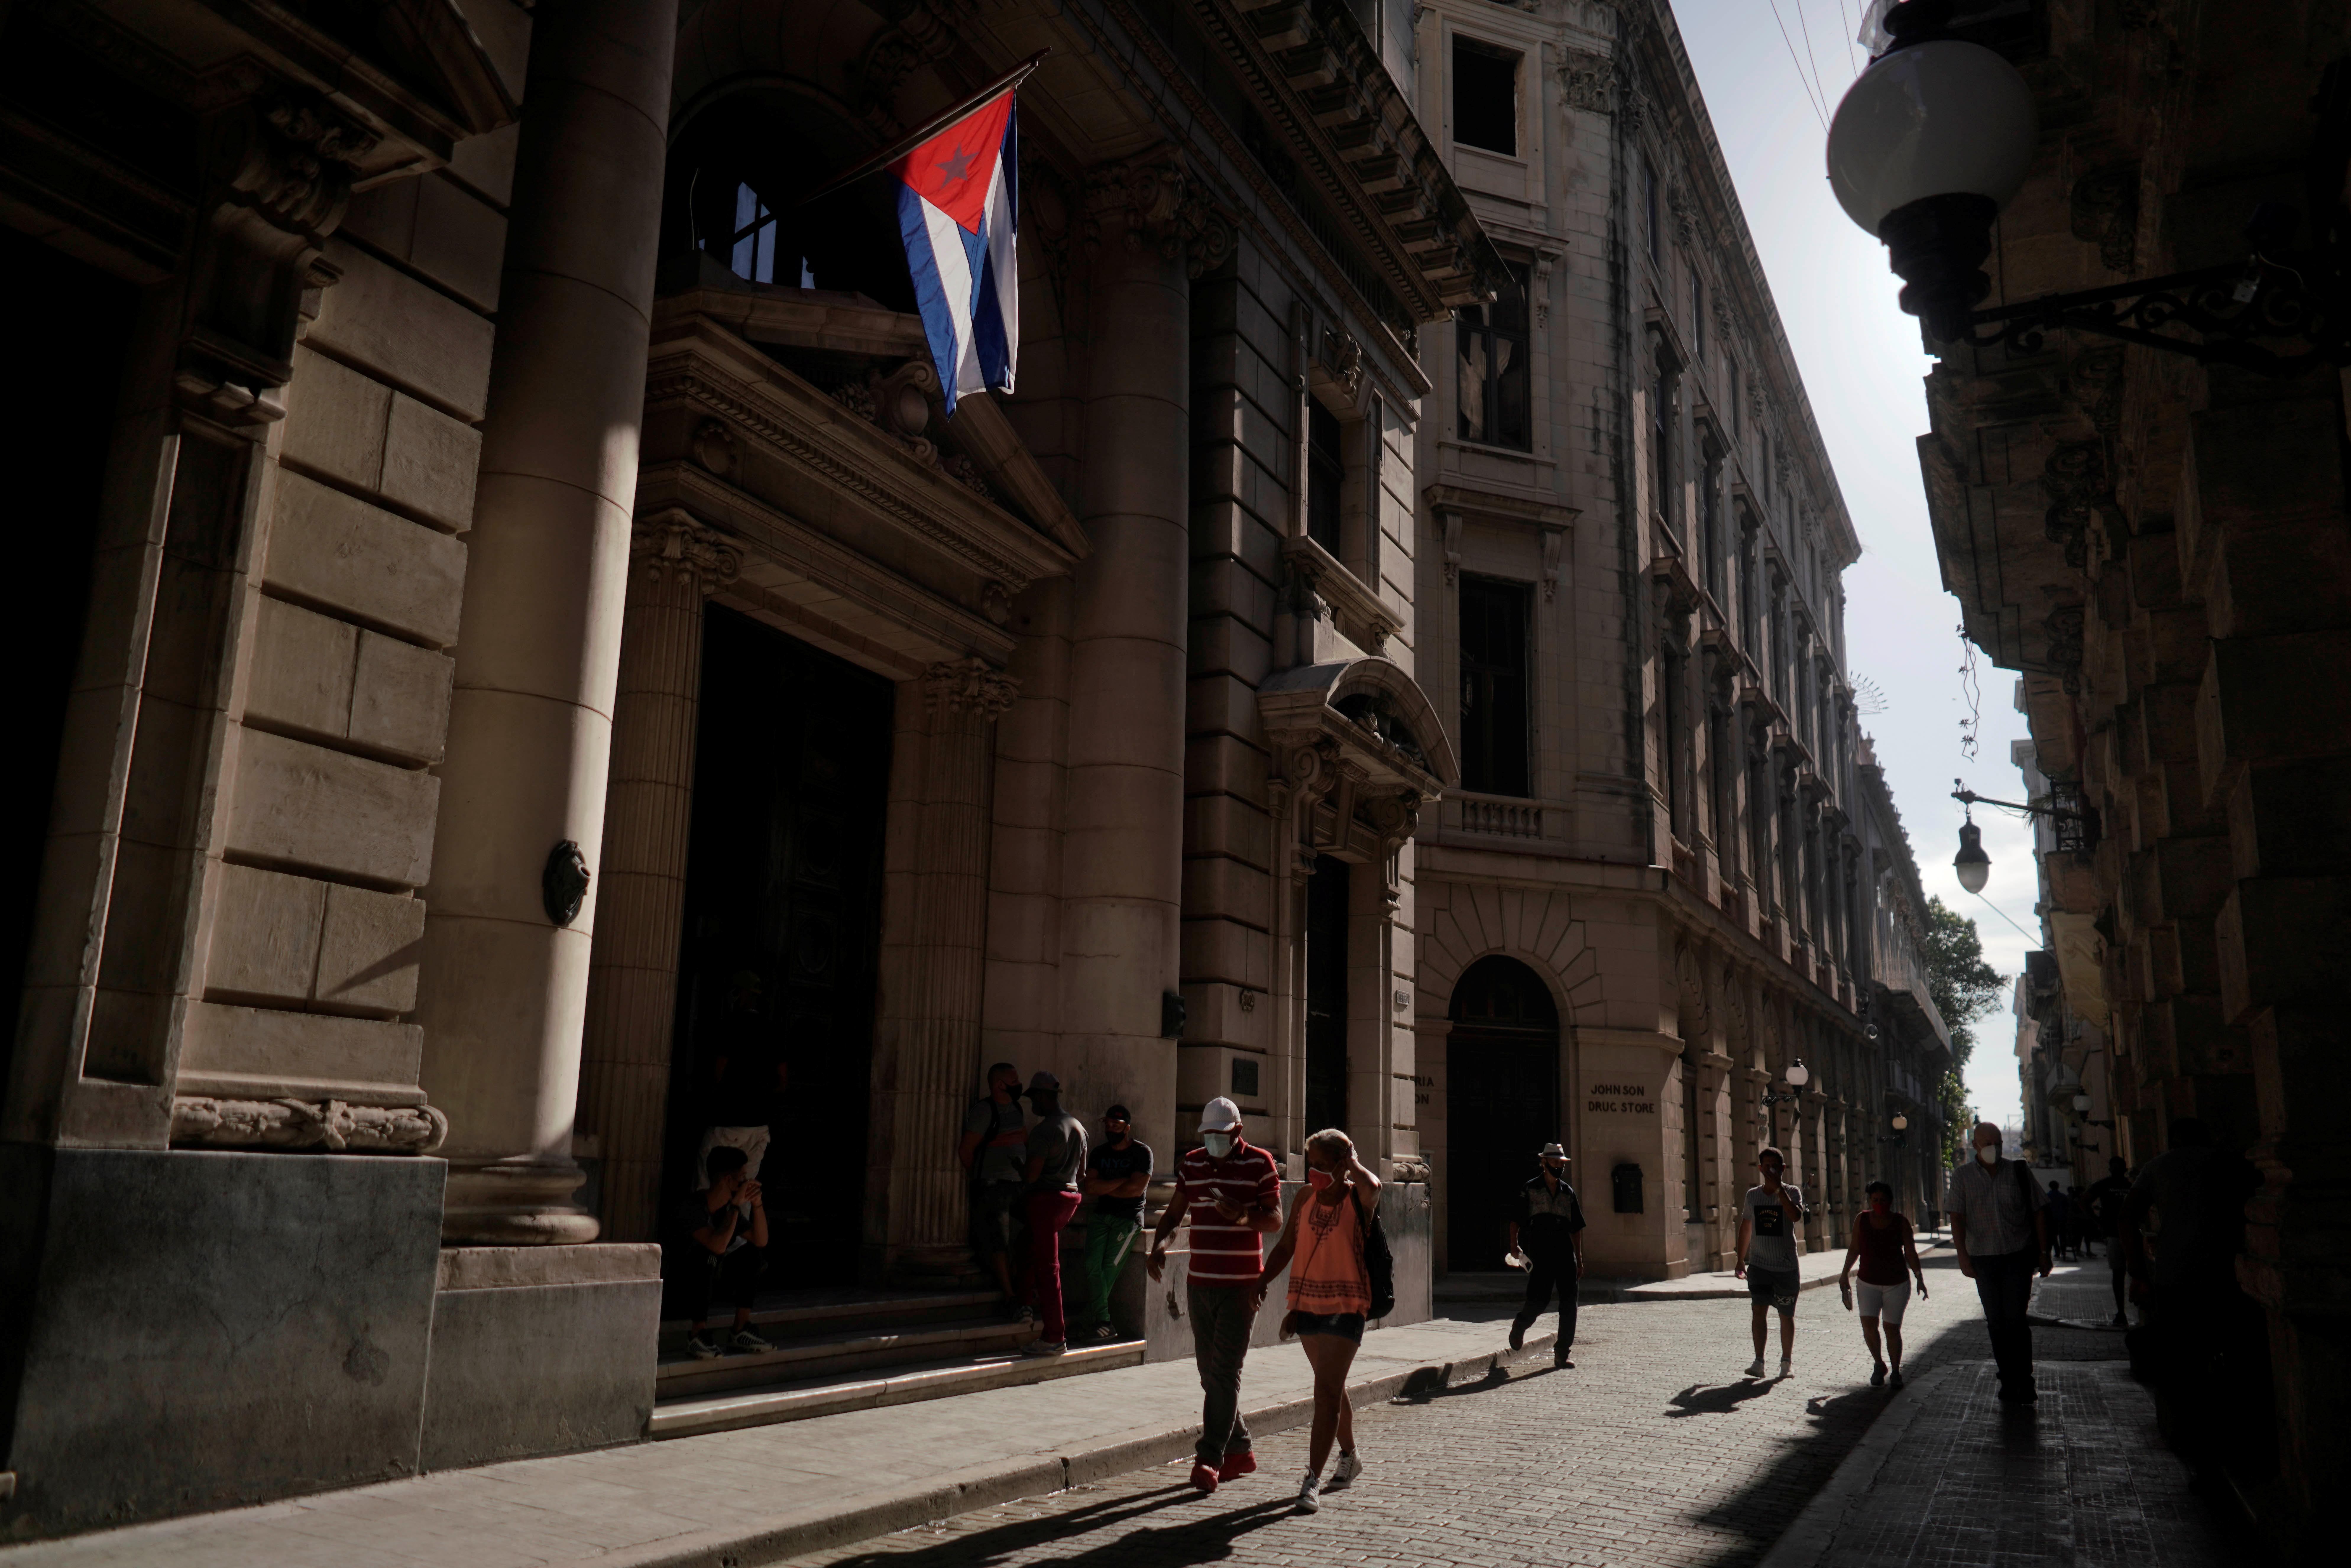 People pass under a Cuban flag in Havana, Cuba, July 13, 2021. REUTERS/Alexandre Meneghini